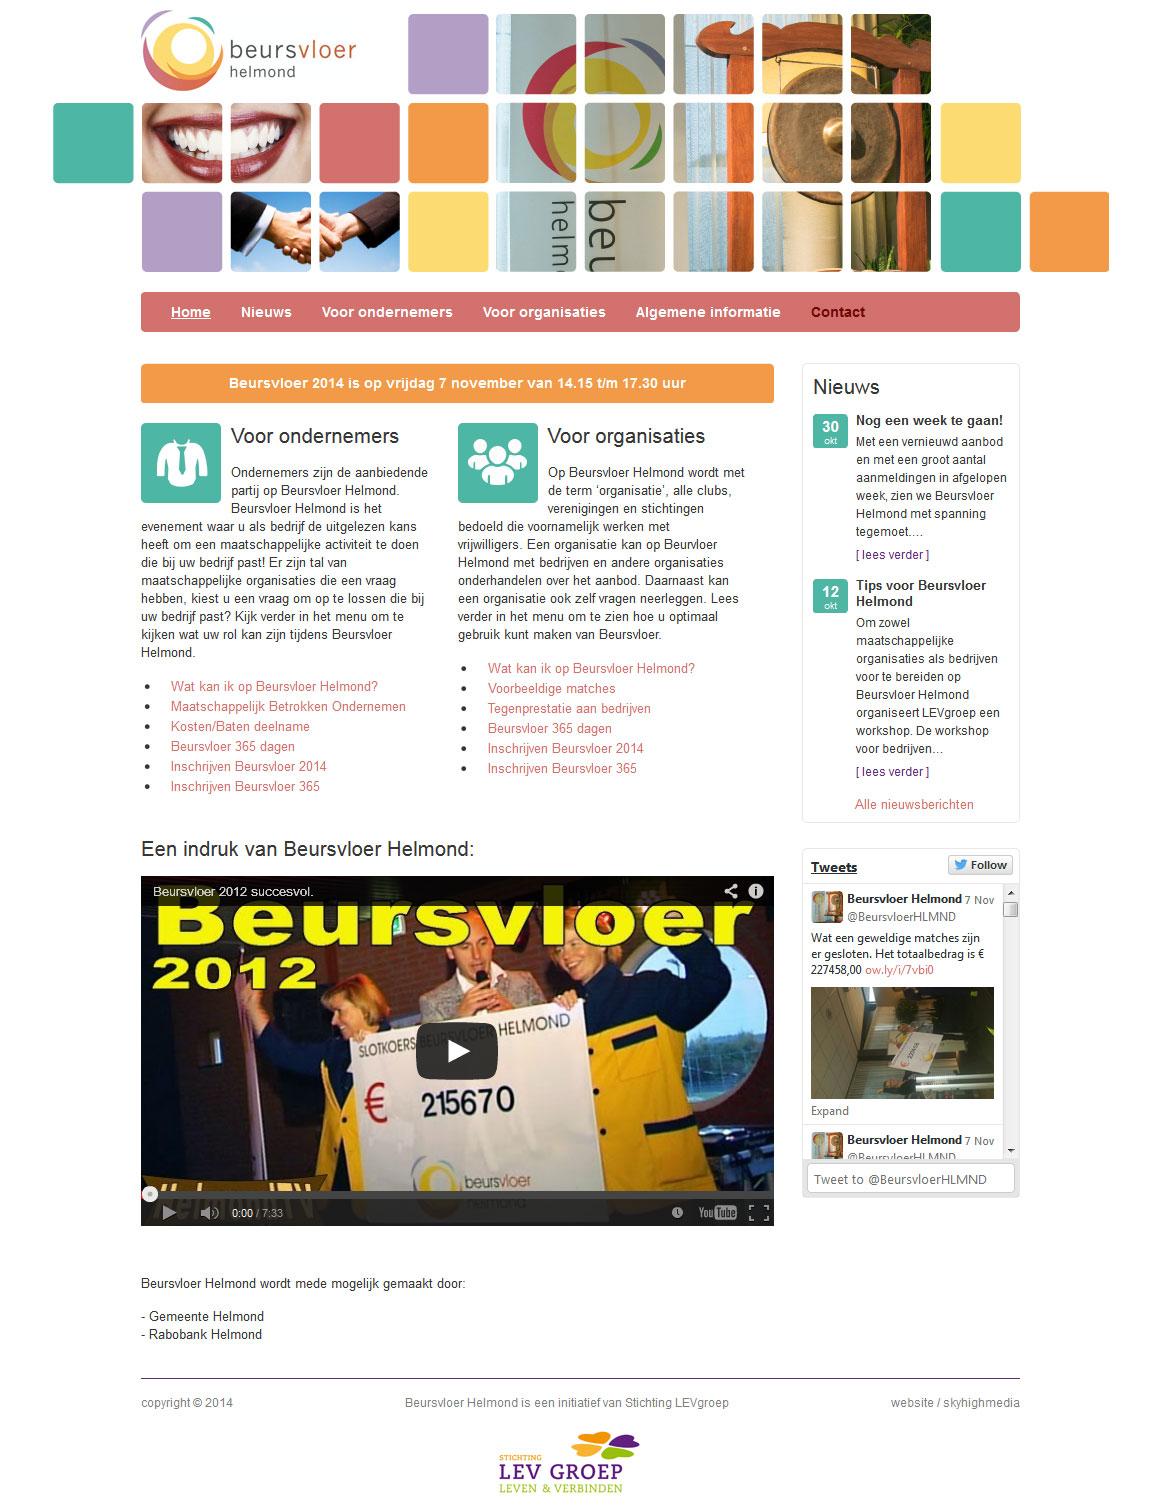 buersvloer-helmond_website1